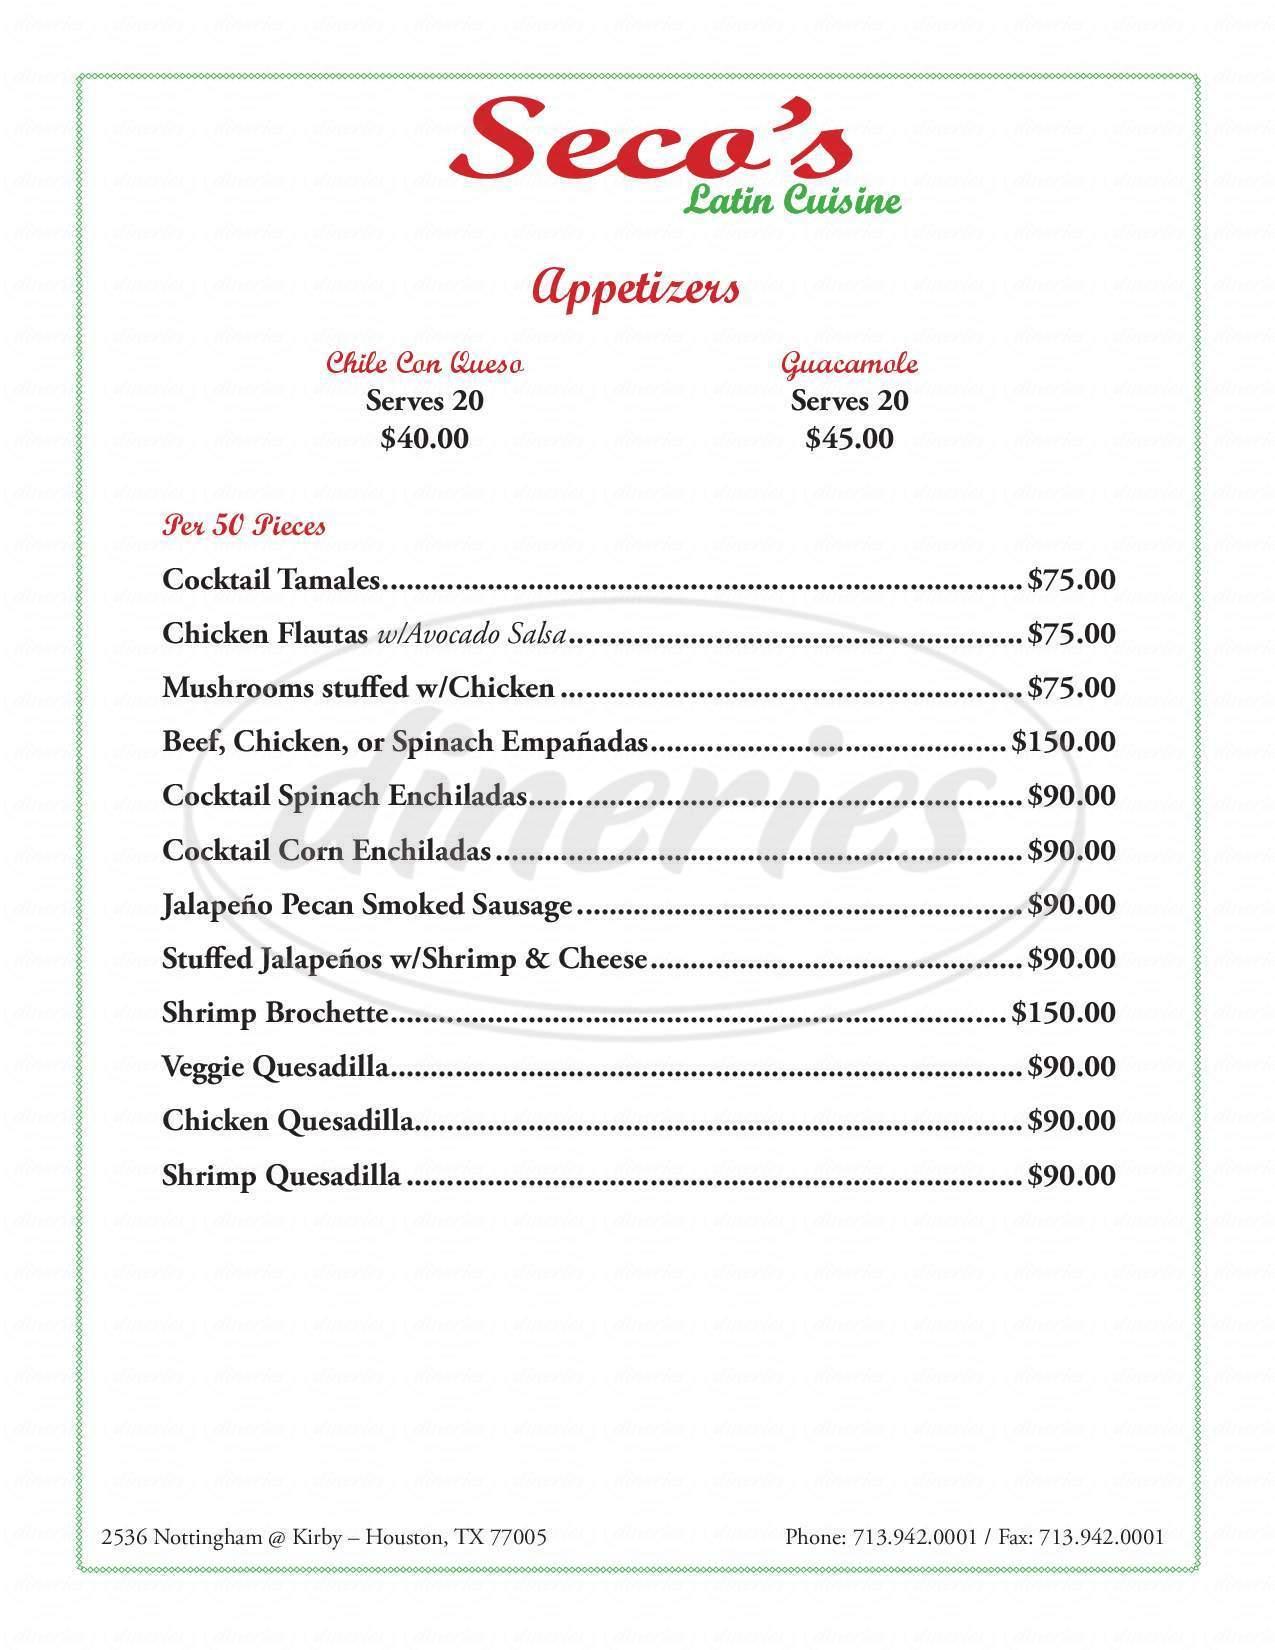 menu for Seco's Latin Cuisine